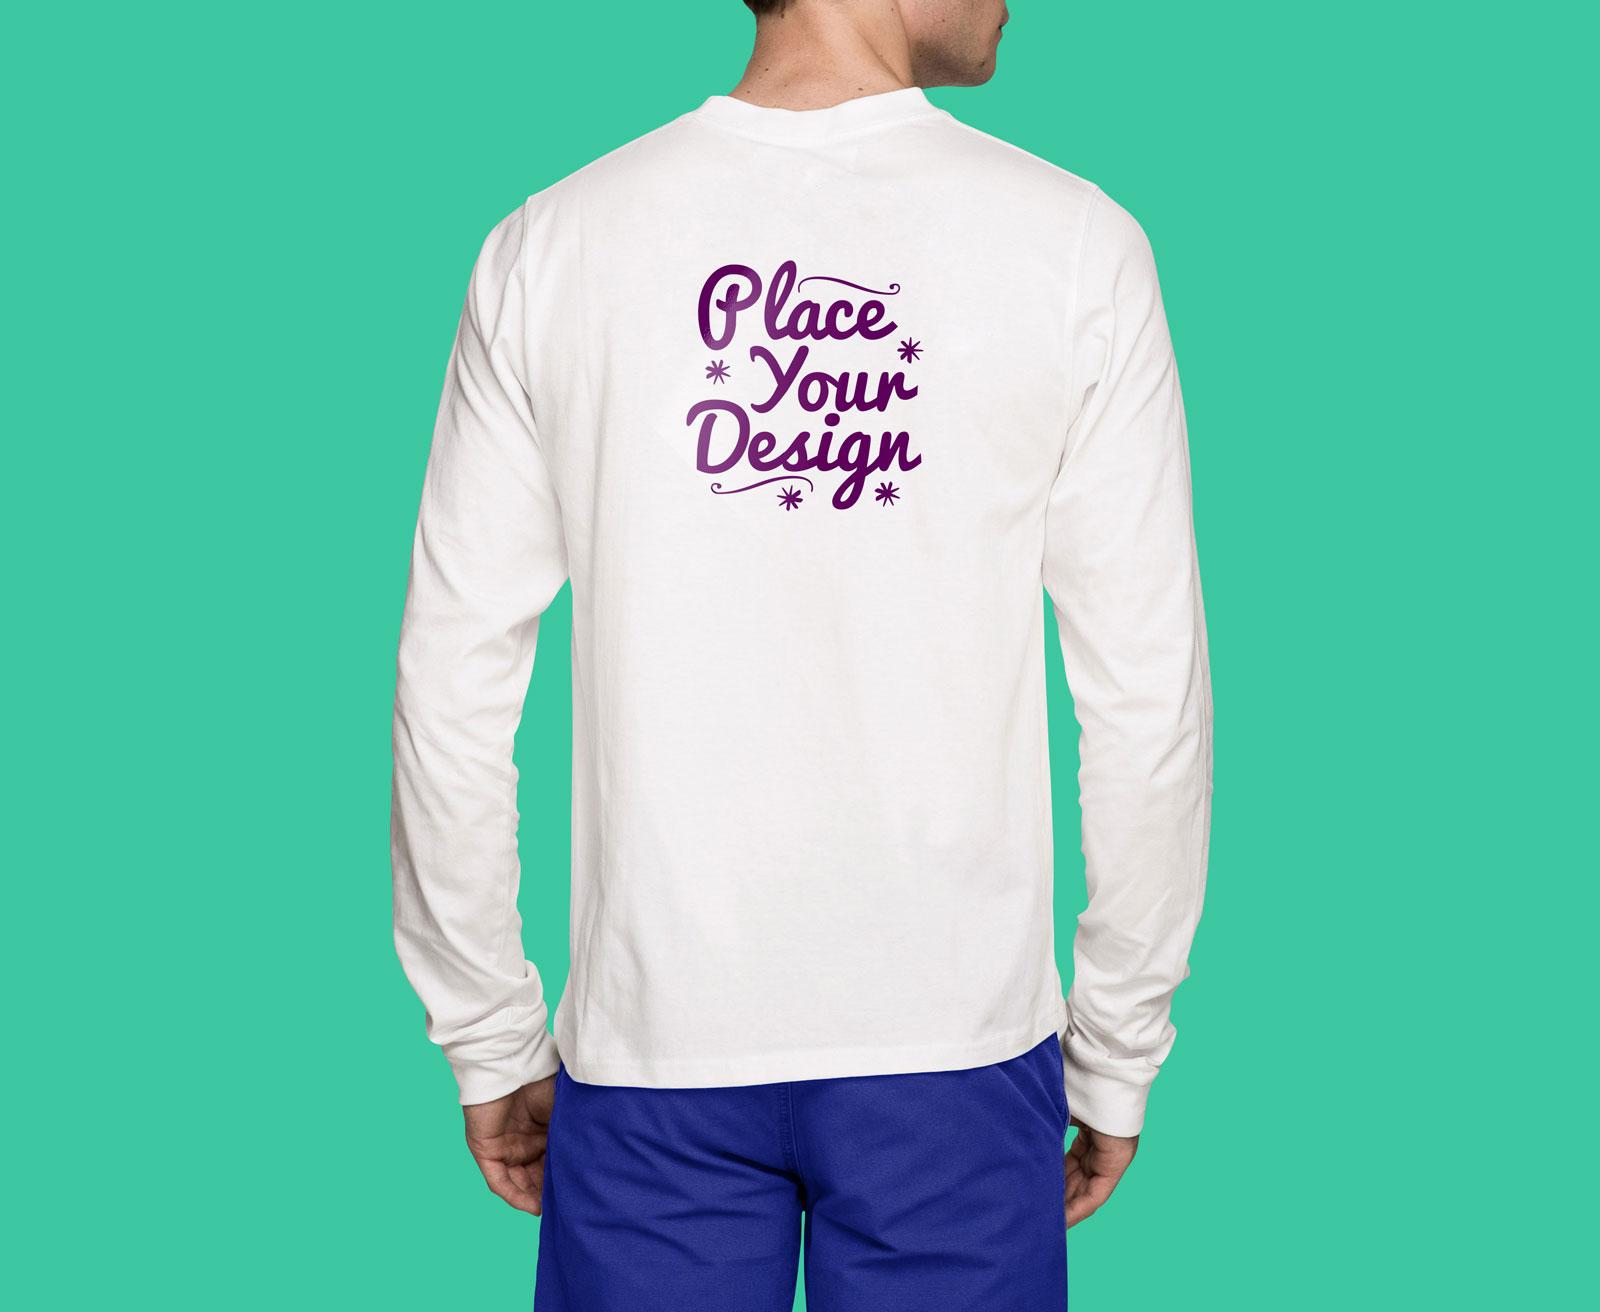 Free-Backside-White-Long-Sleeves-T-Shirt-Mockup-PSD